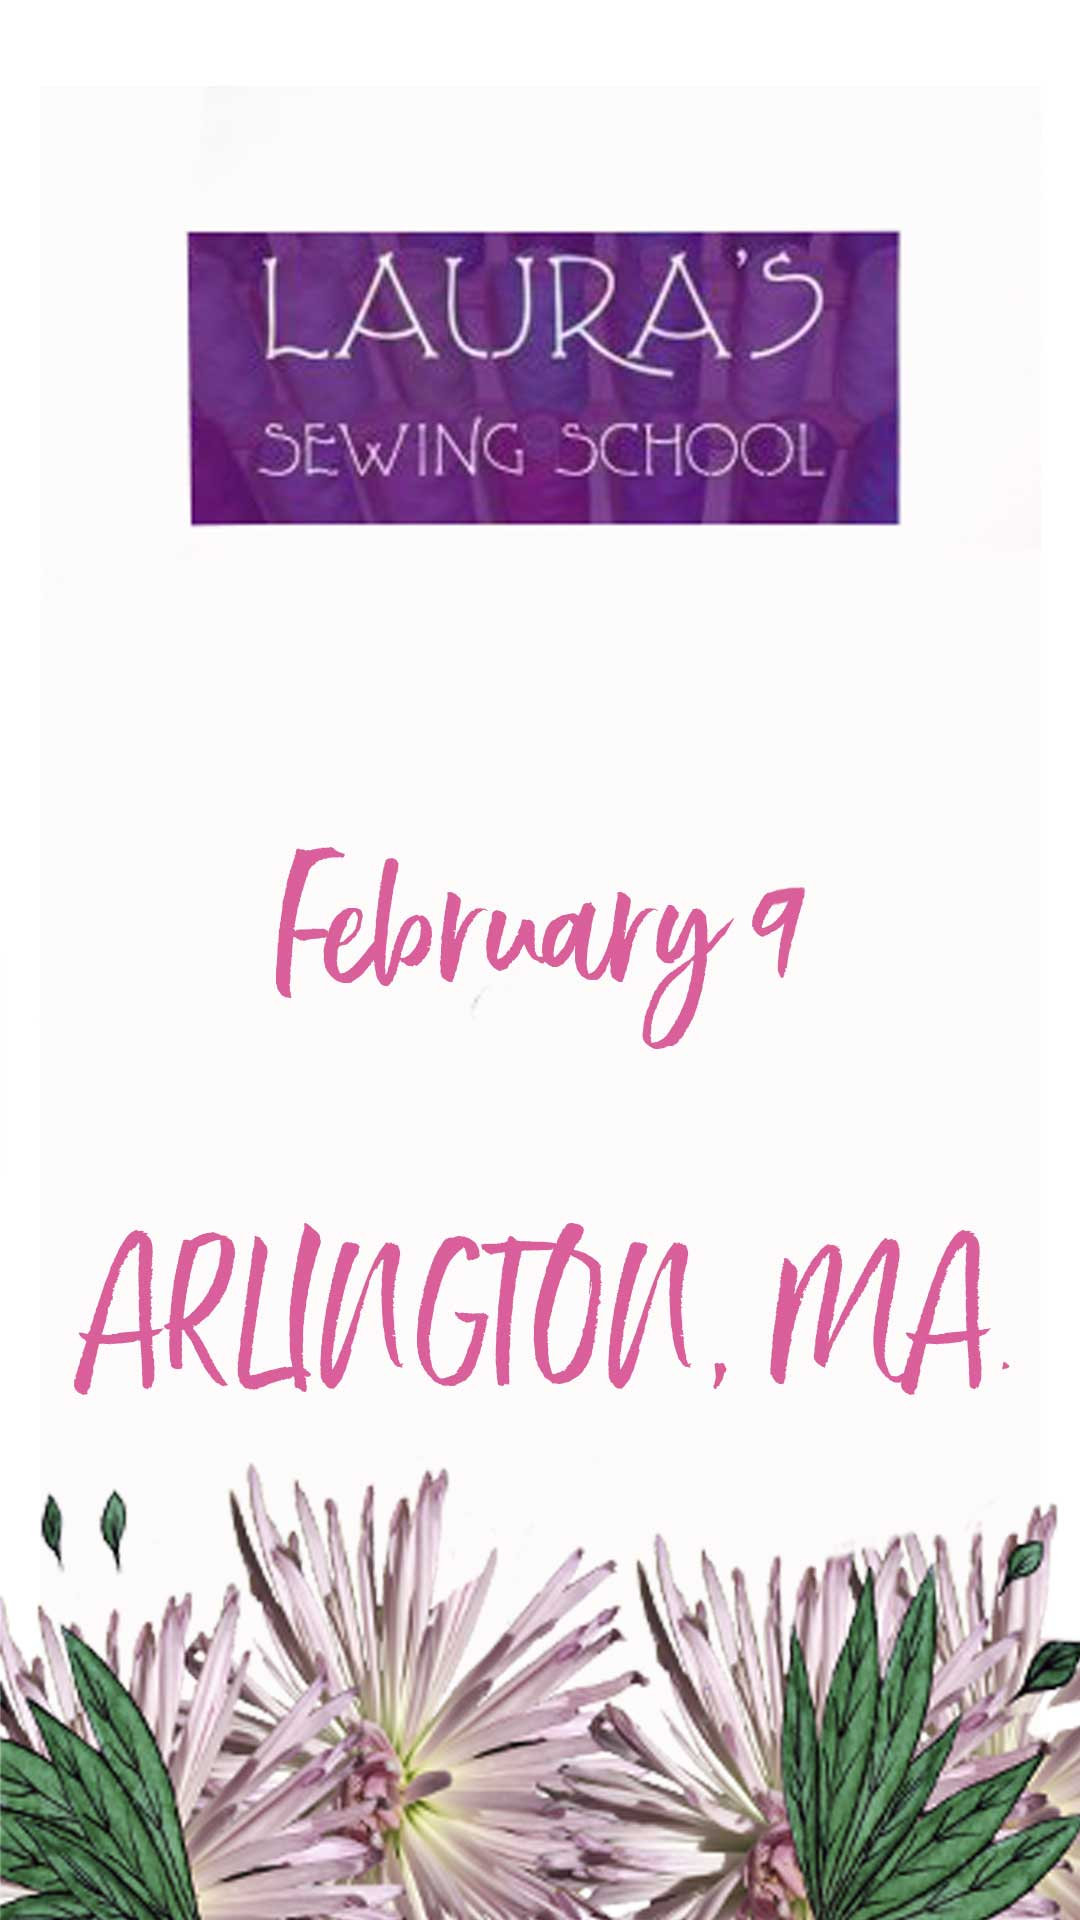 Laura's Sewing School Arlington, MA